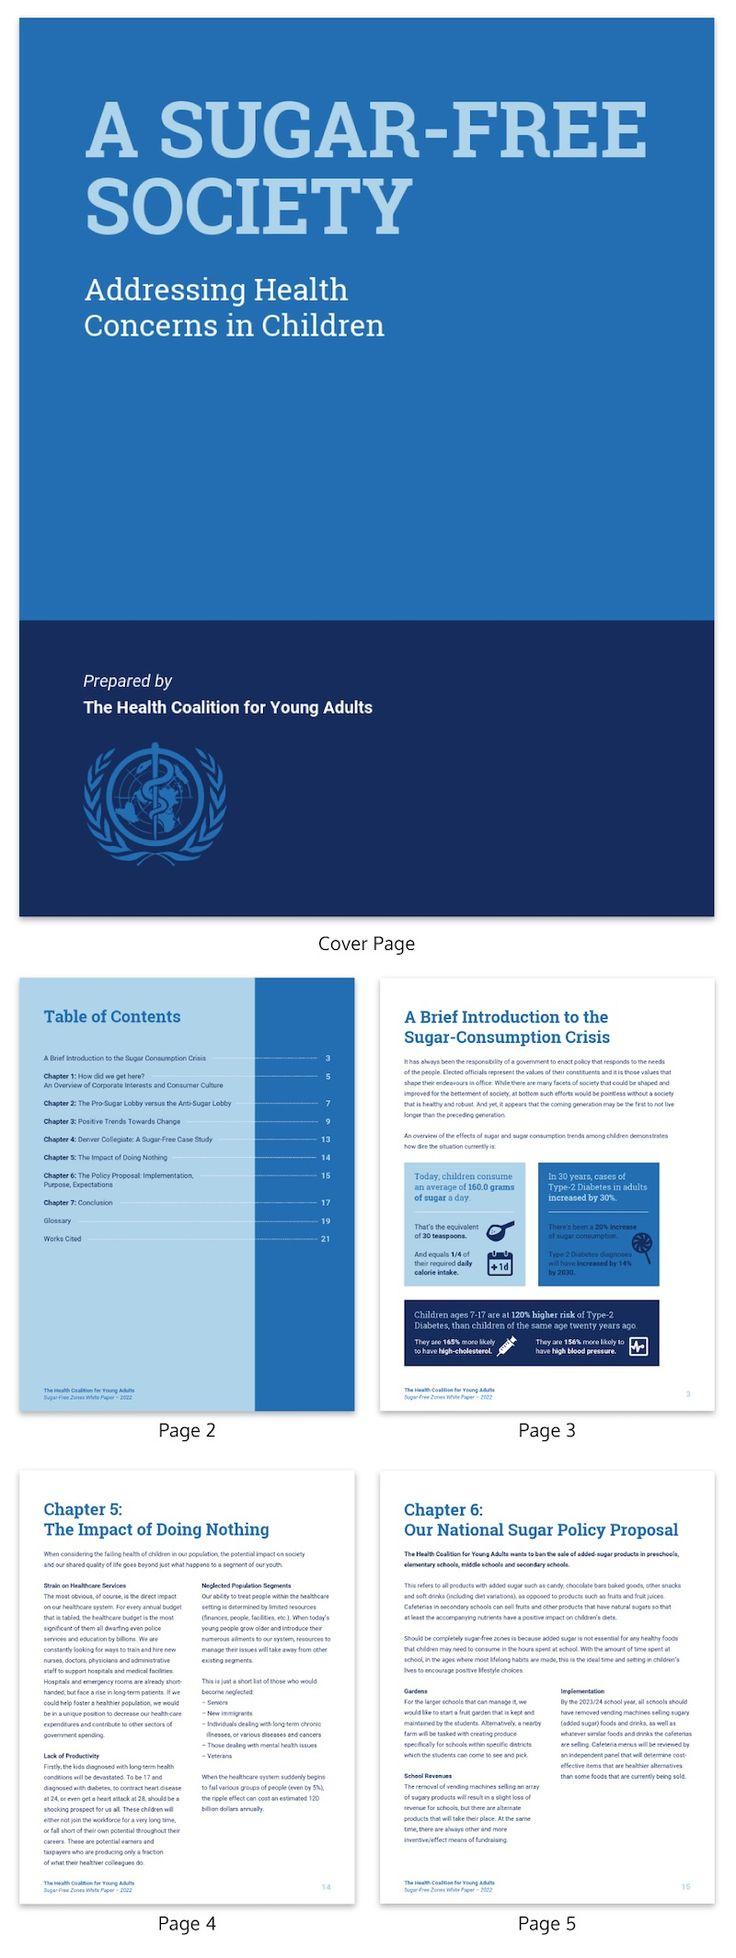 Courseworks columbia edu address stamp